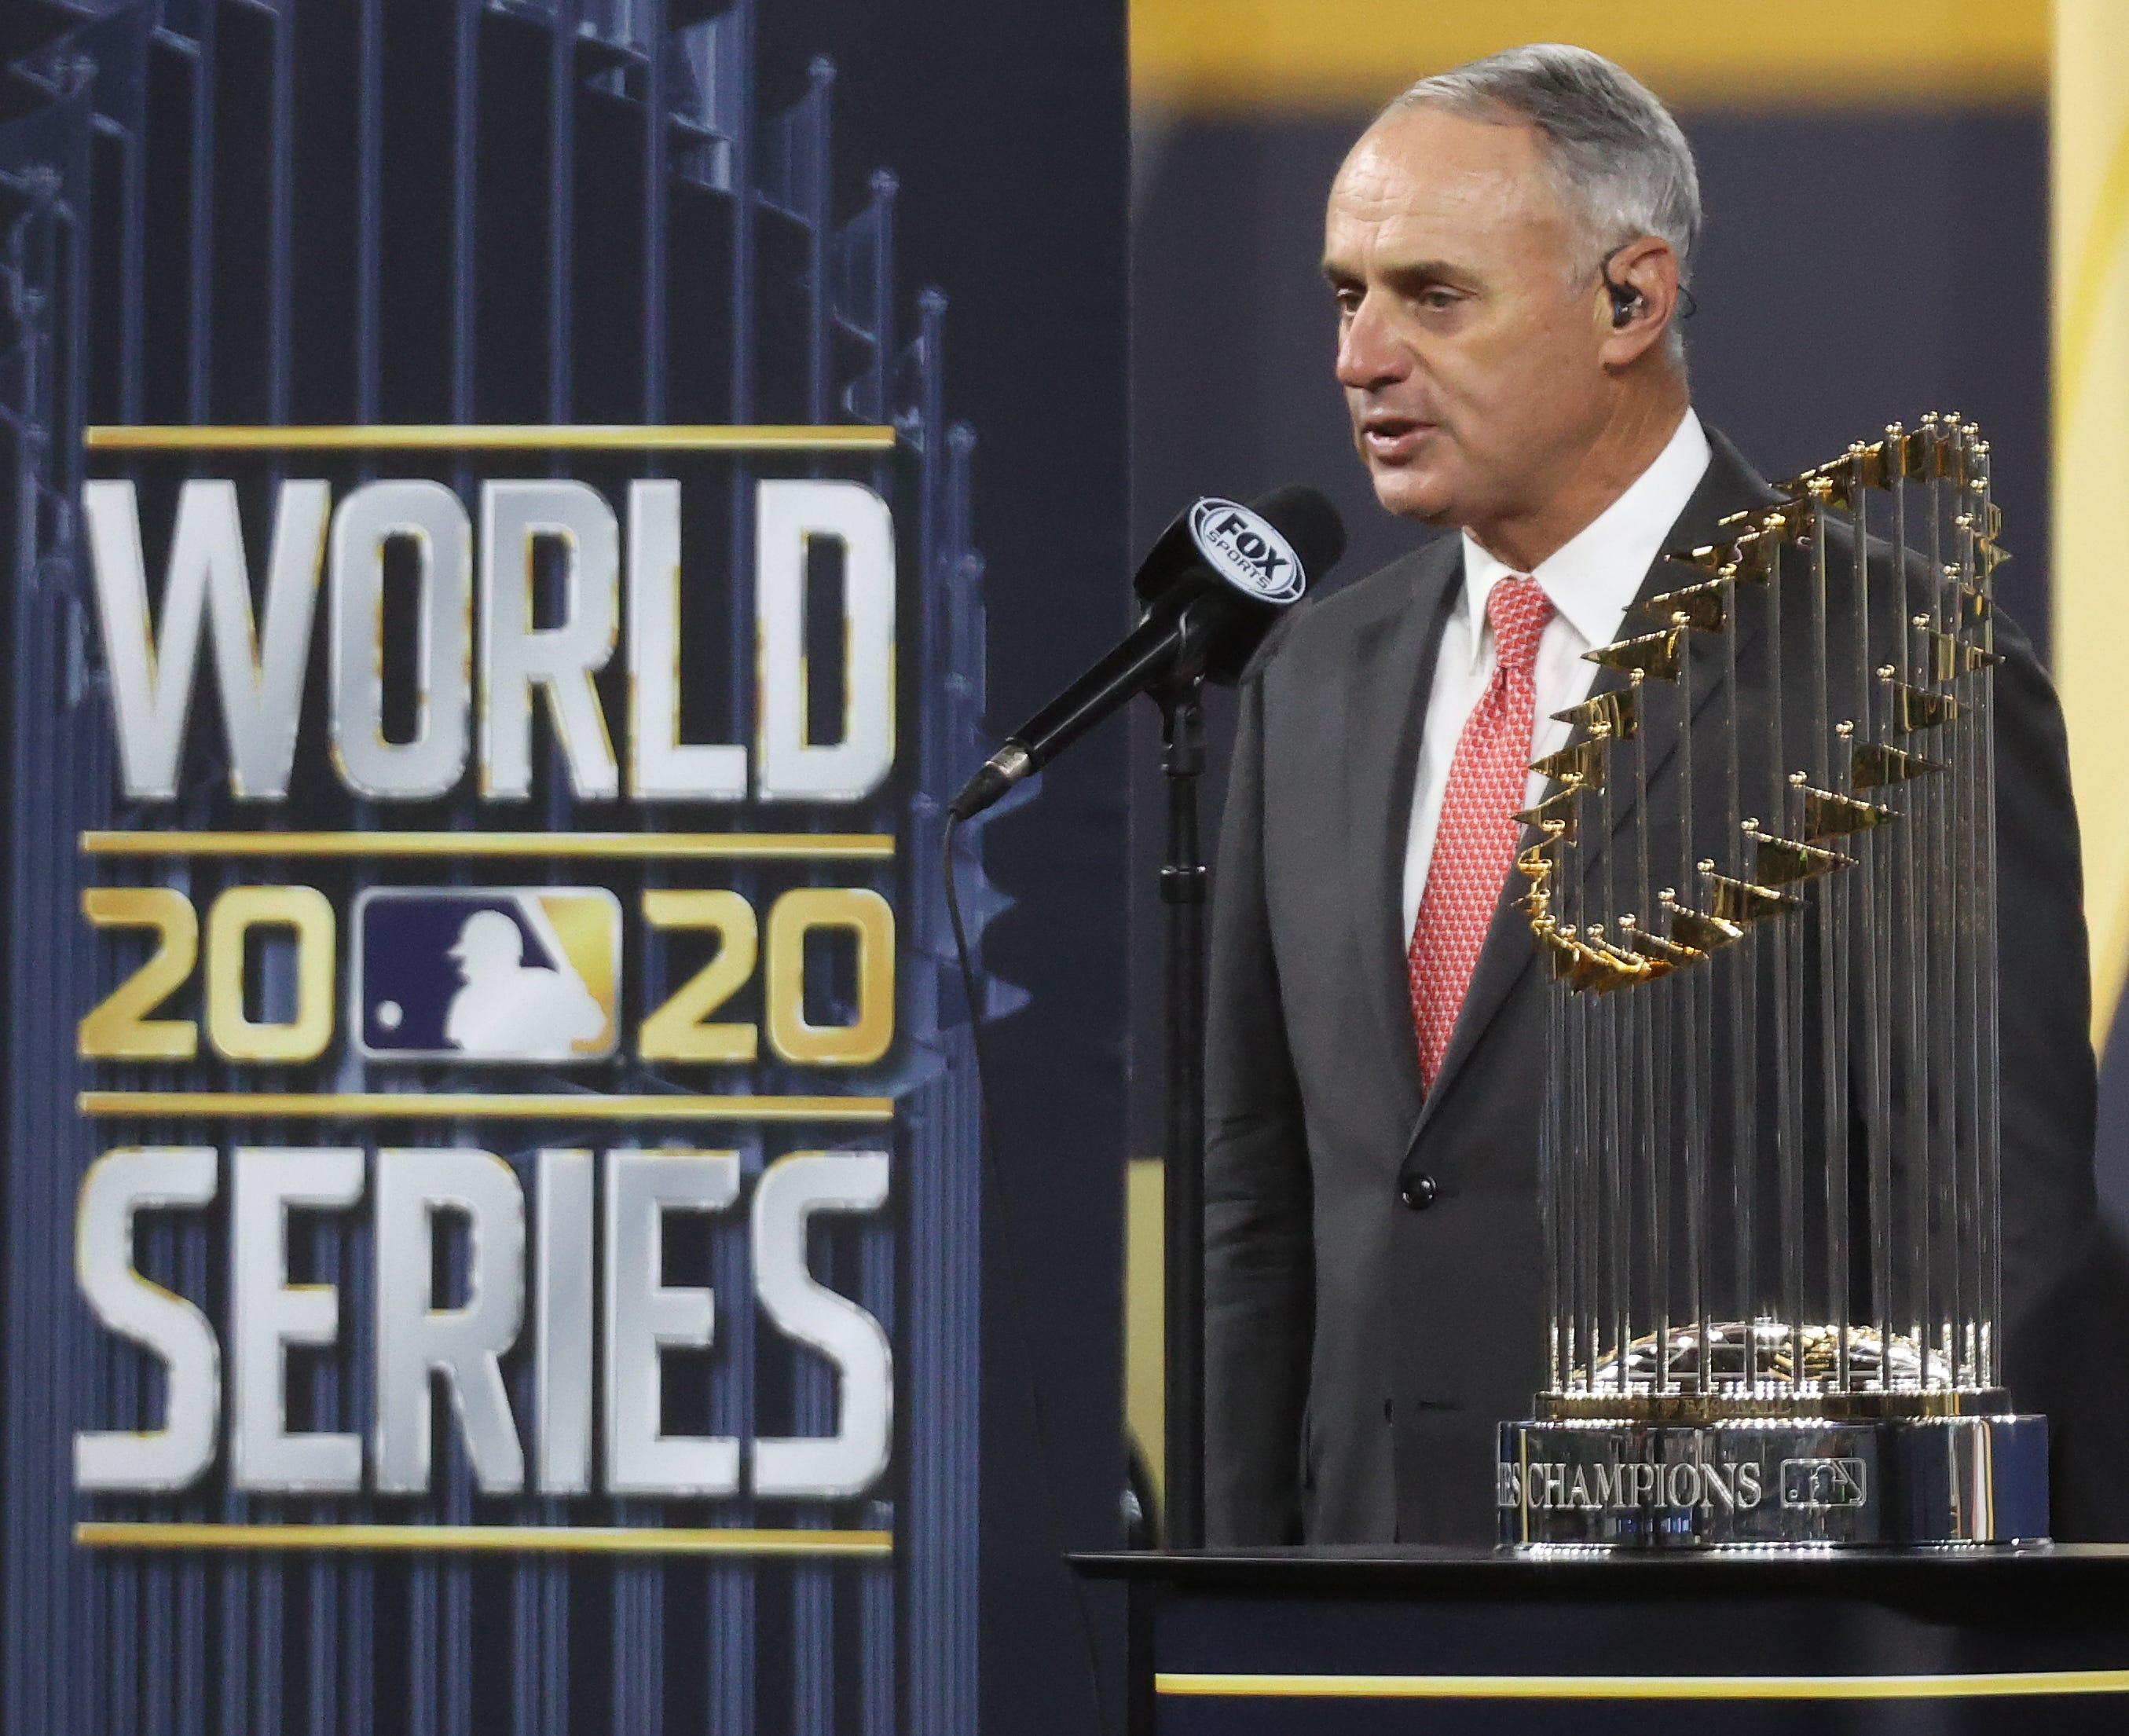 MLB commissioner Rob Manfred says 'baseball should be proud' of 2020 season